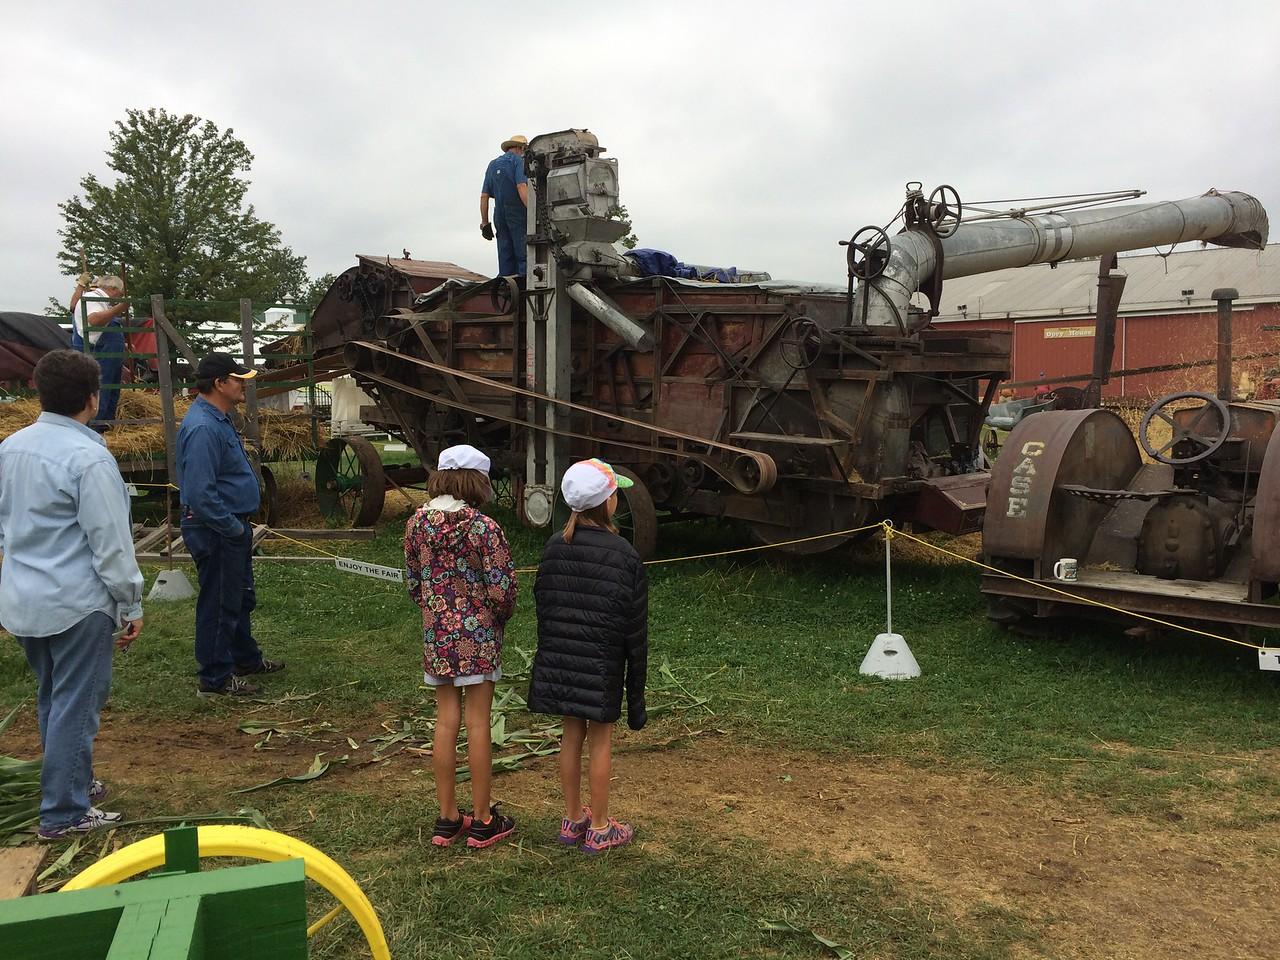 Watching hay baling at the Indiana State Fair.